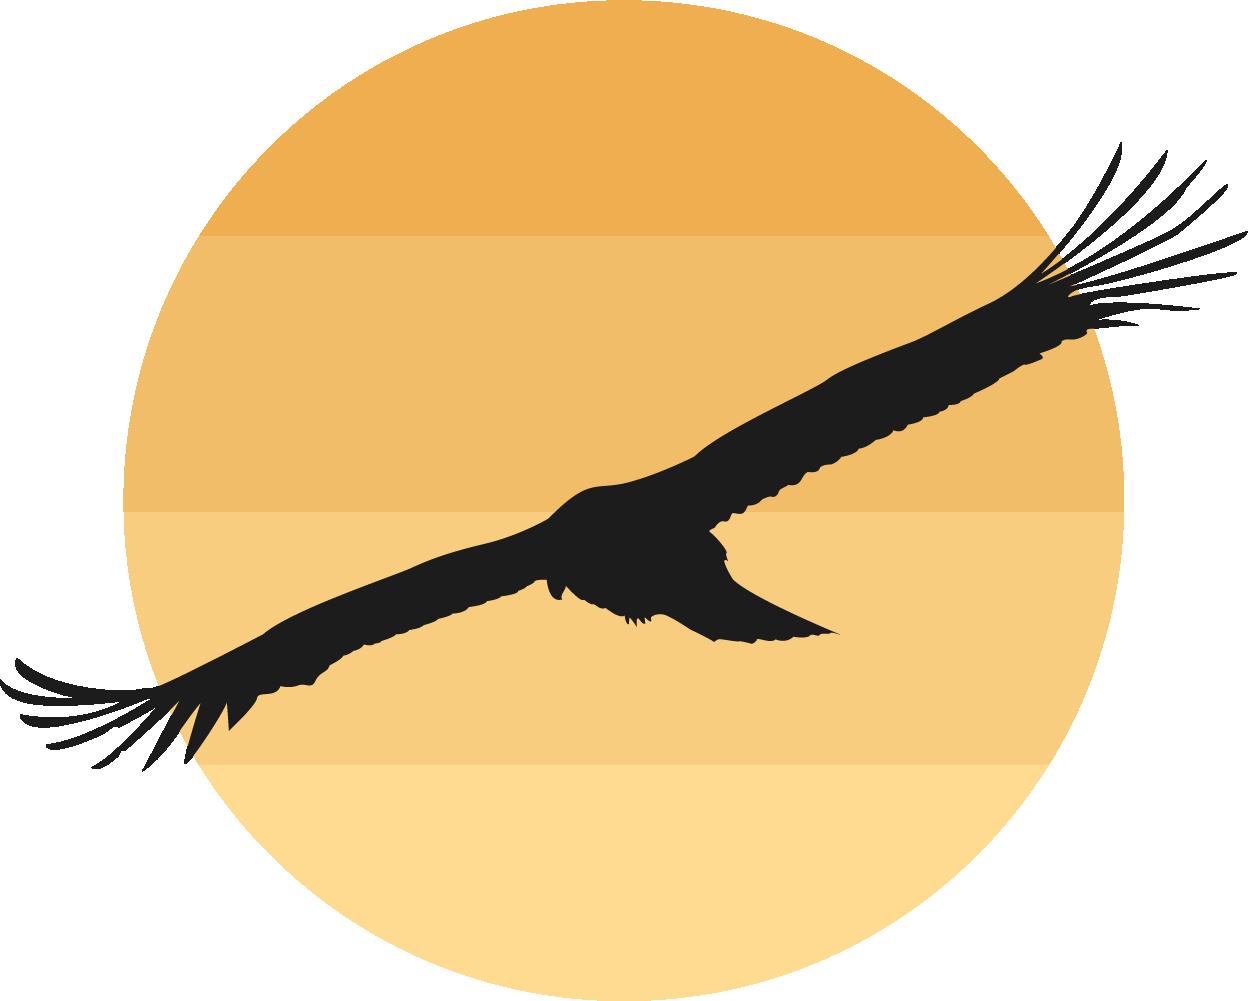 Flying clipart wild bird. Domestic goose clip art